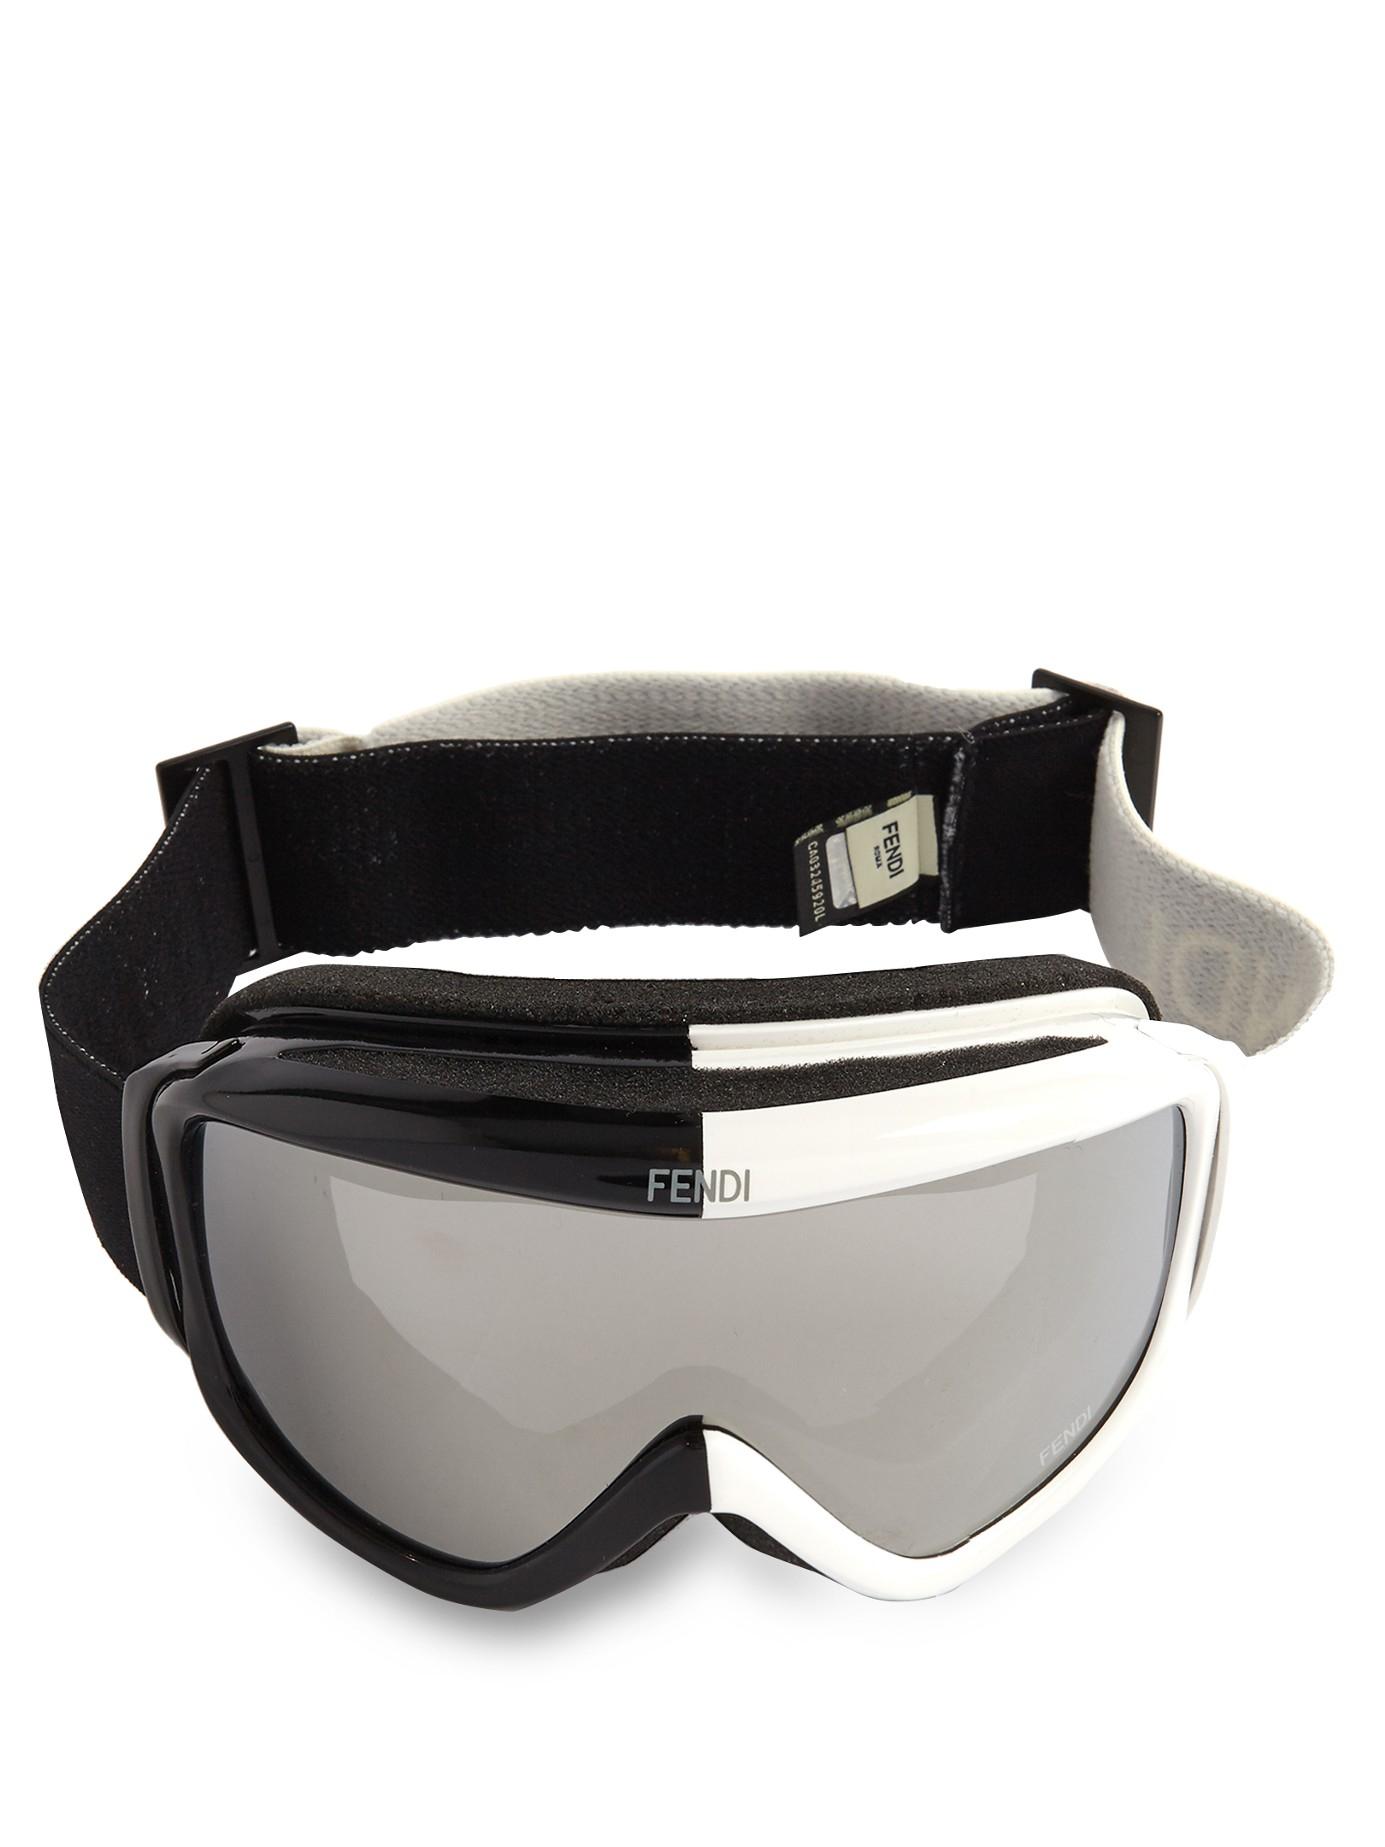 c2bf4700aa7 Lyst - Fendi Bi-colour Logo Strap Goggles for Men